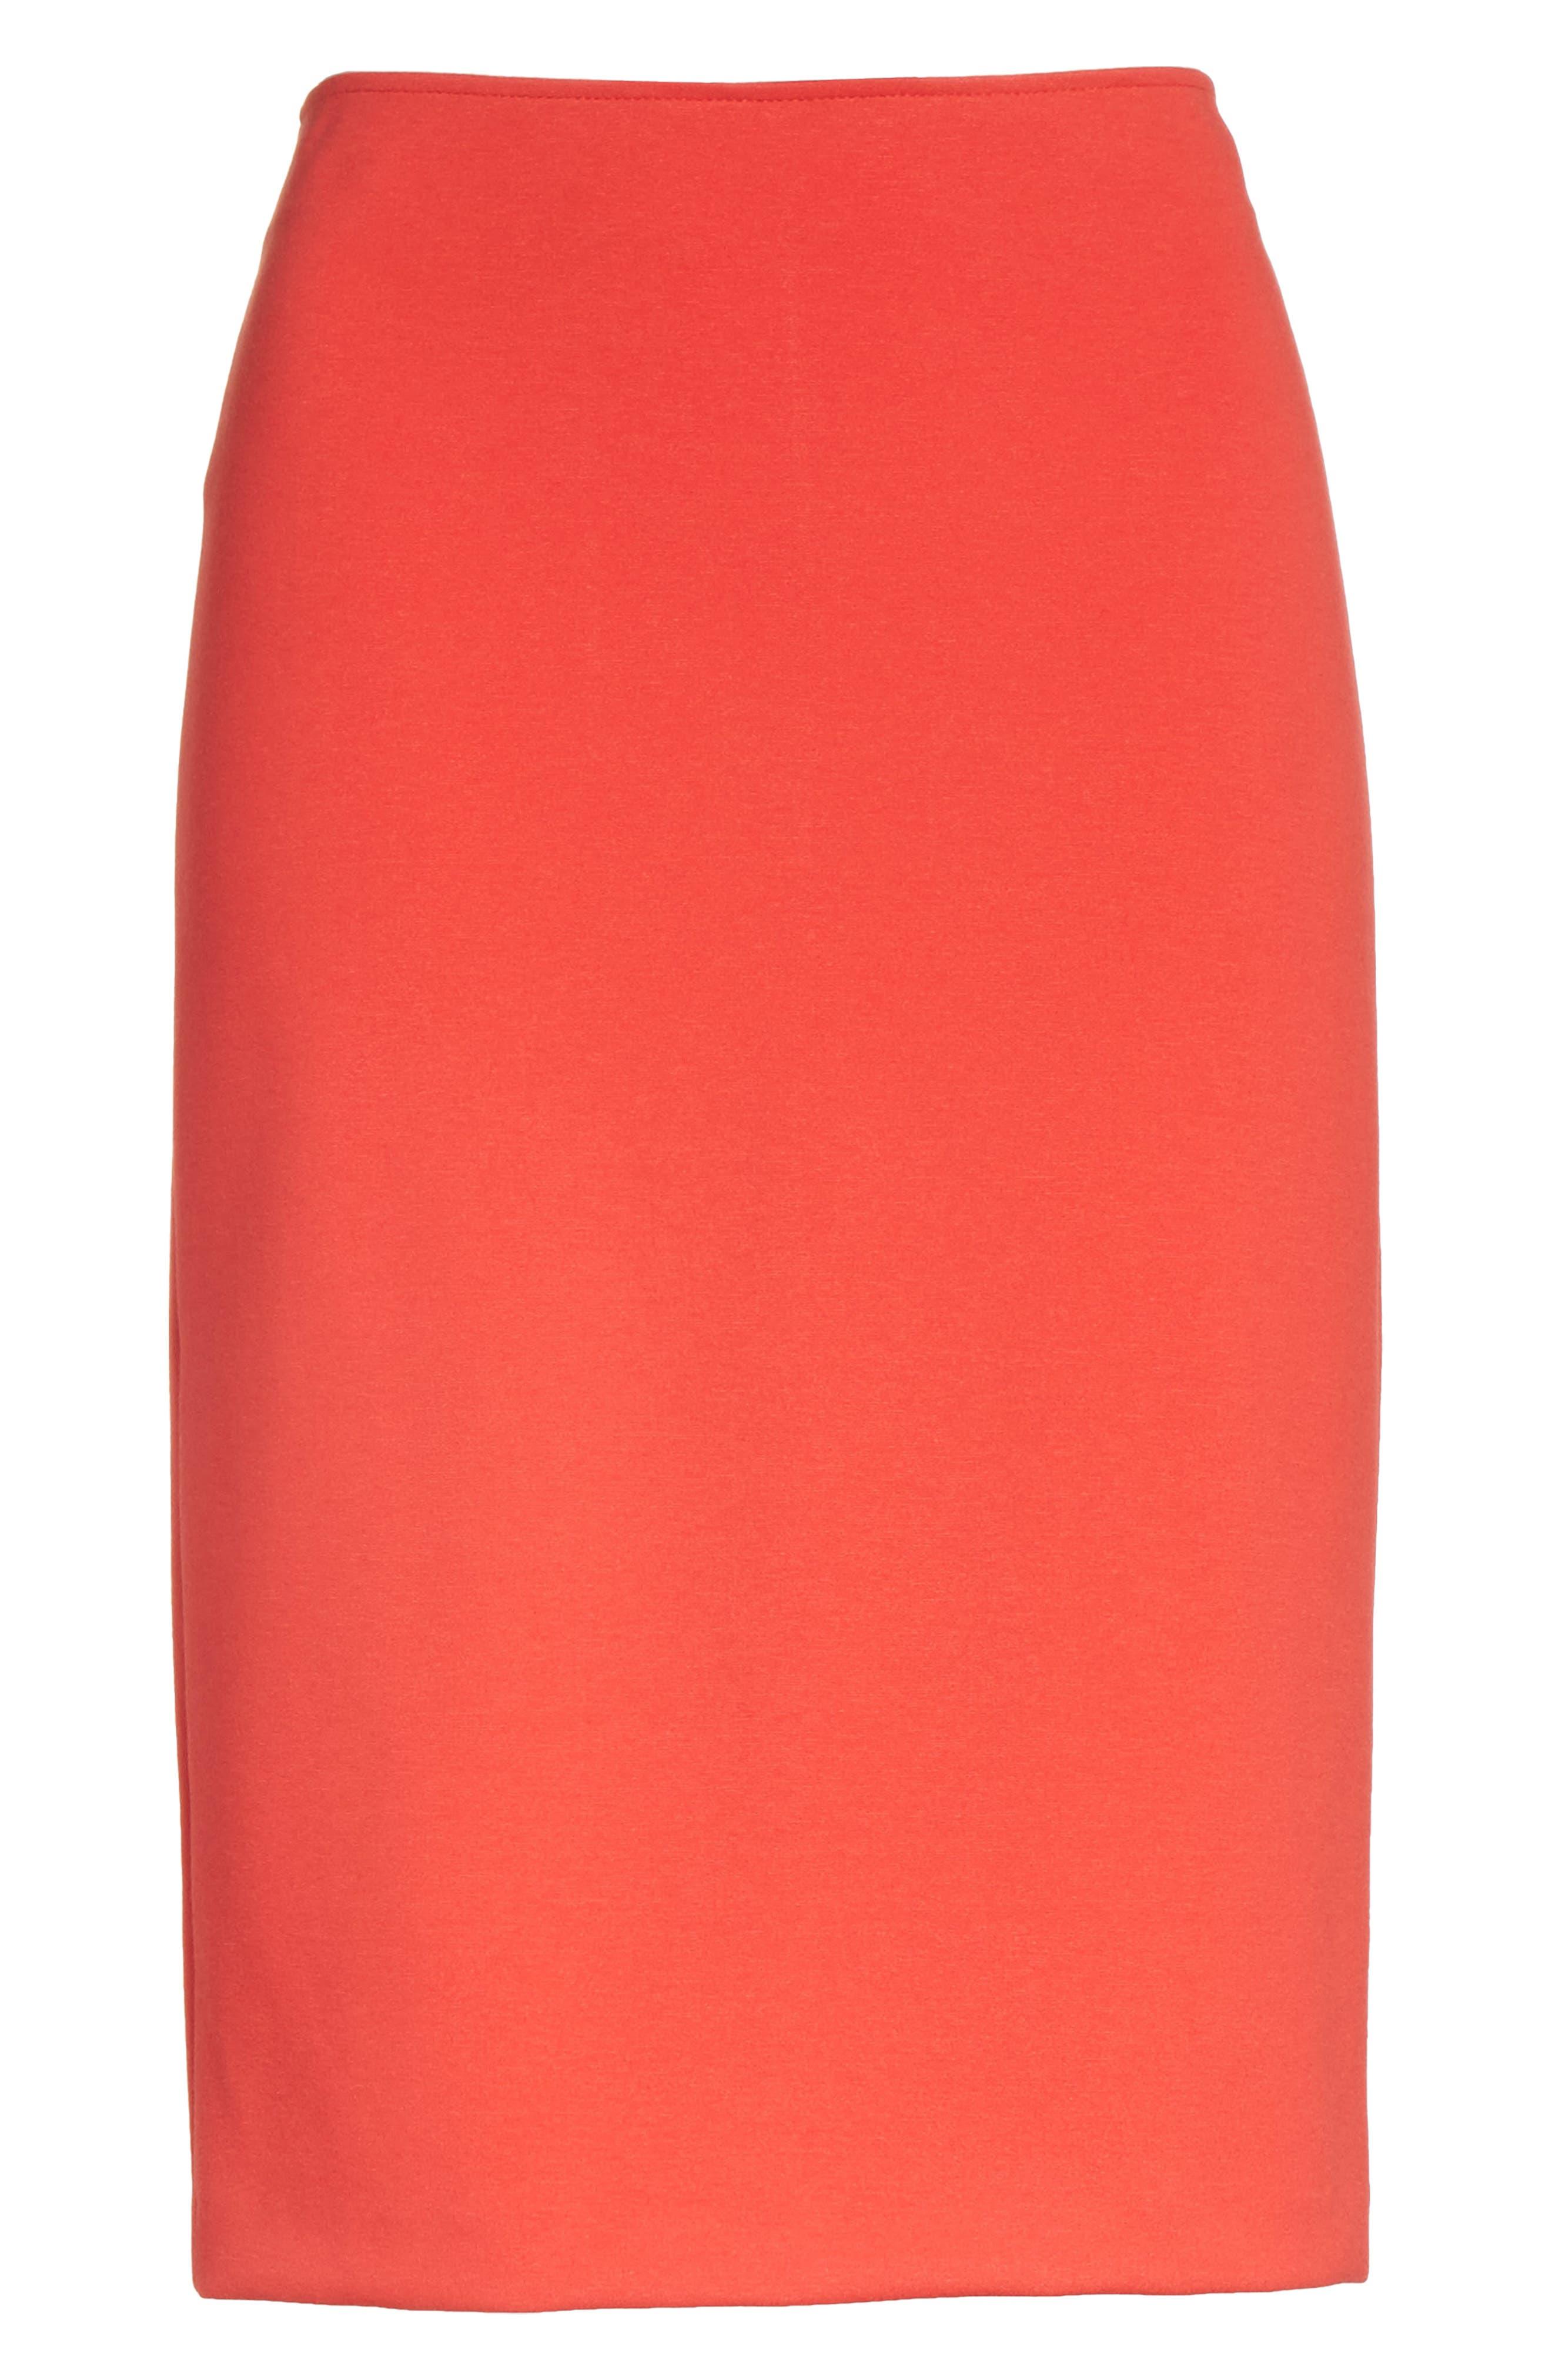 Milano Jersey Pencil Skirt,                             Alternate thumbnail 7, color,                             Solid Bright Orange